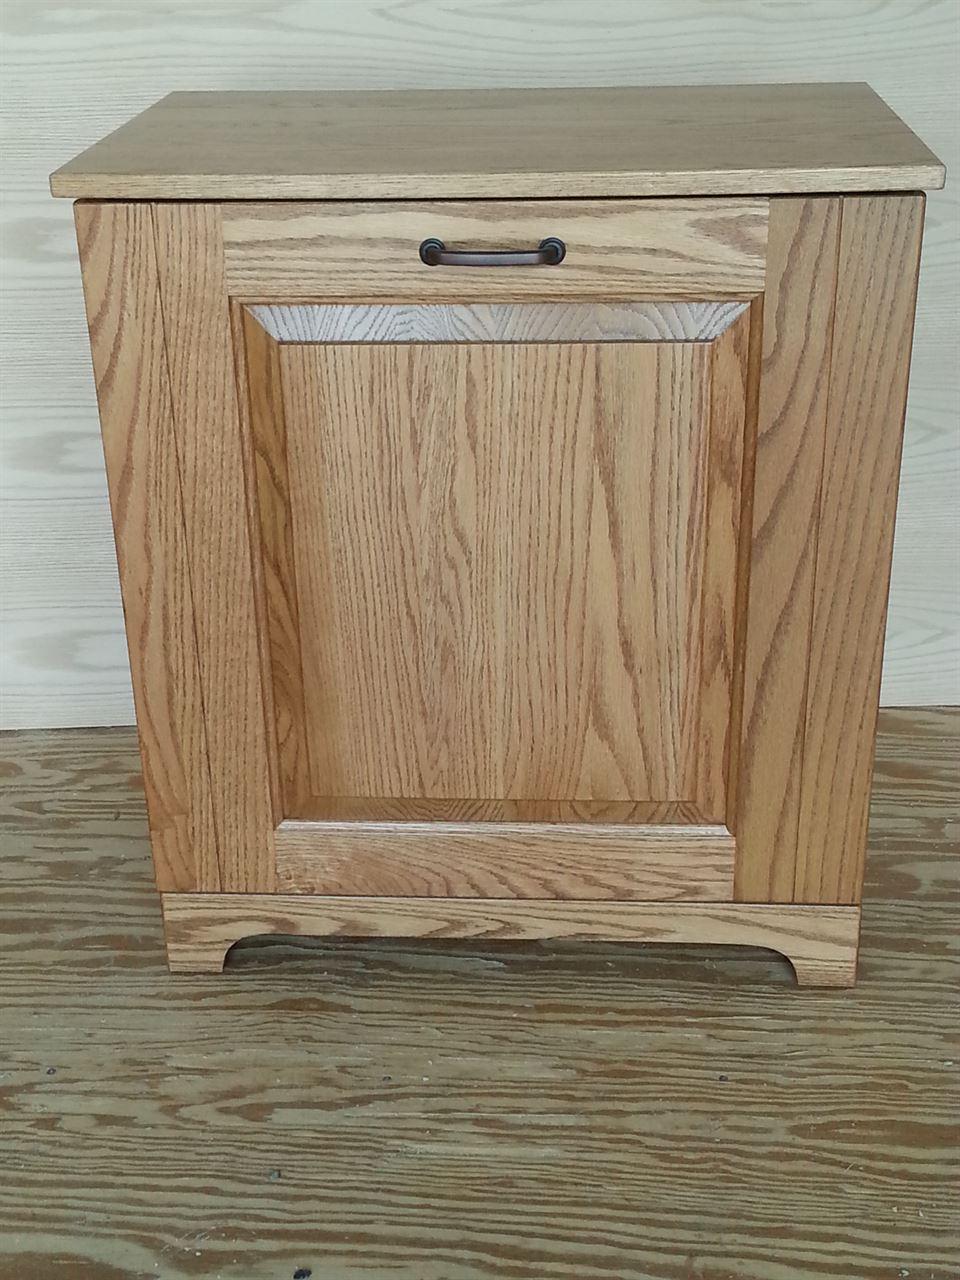 Four Seasons FurnishingsAmish Made Furniture  Amish made